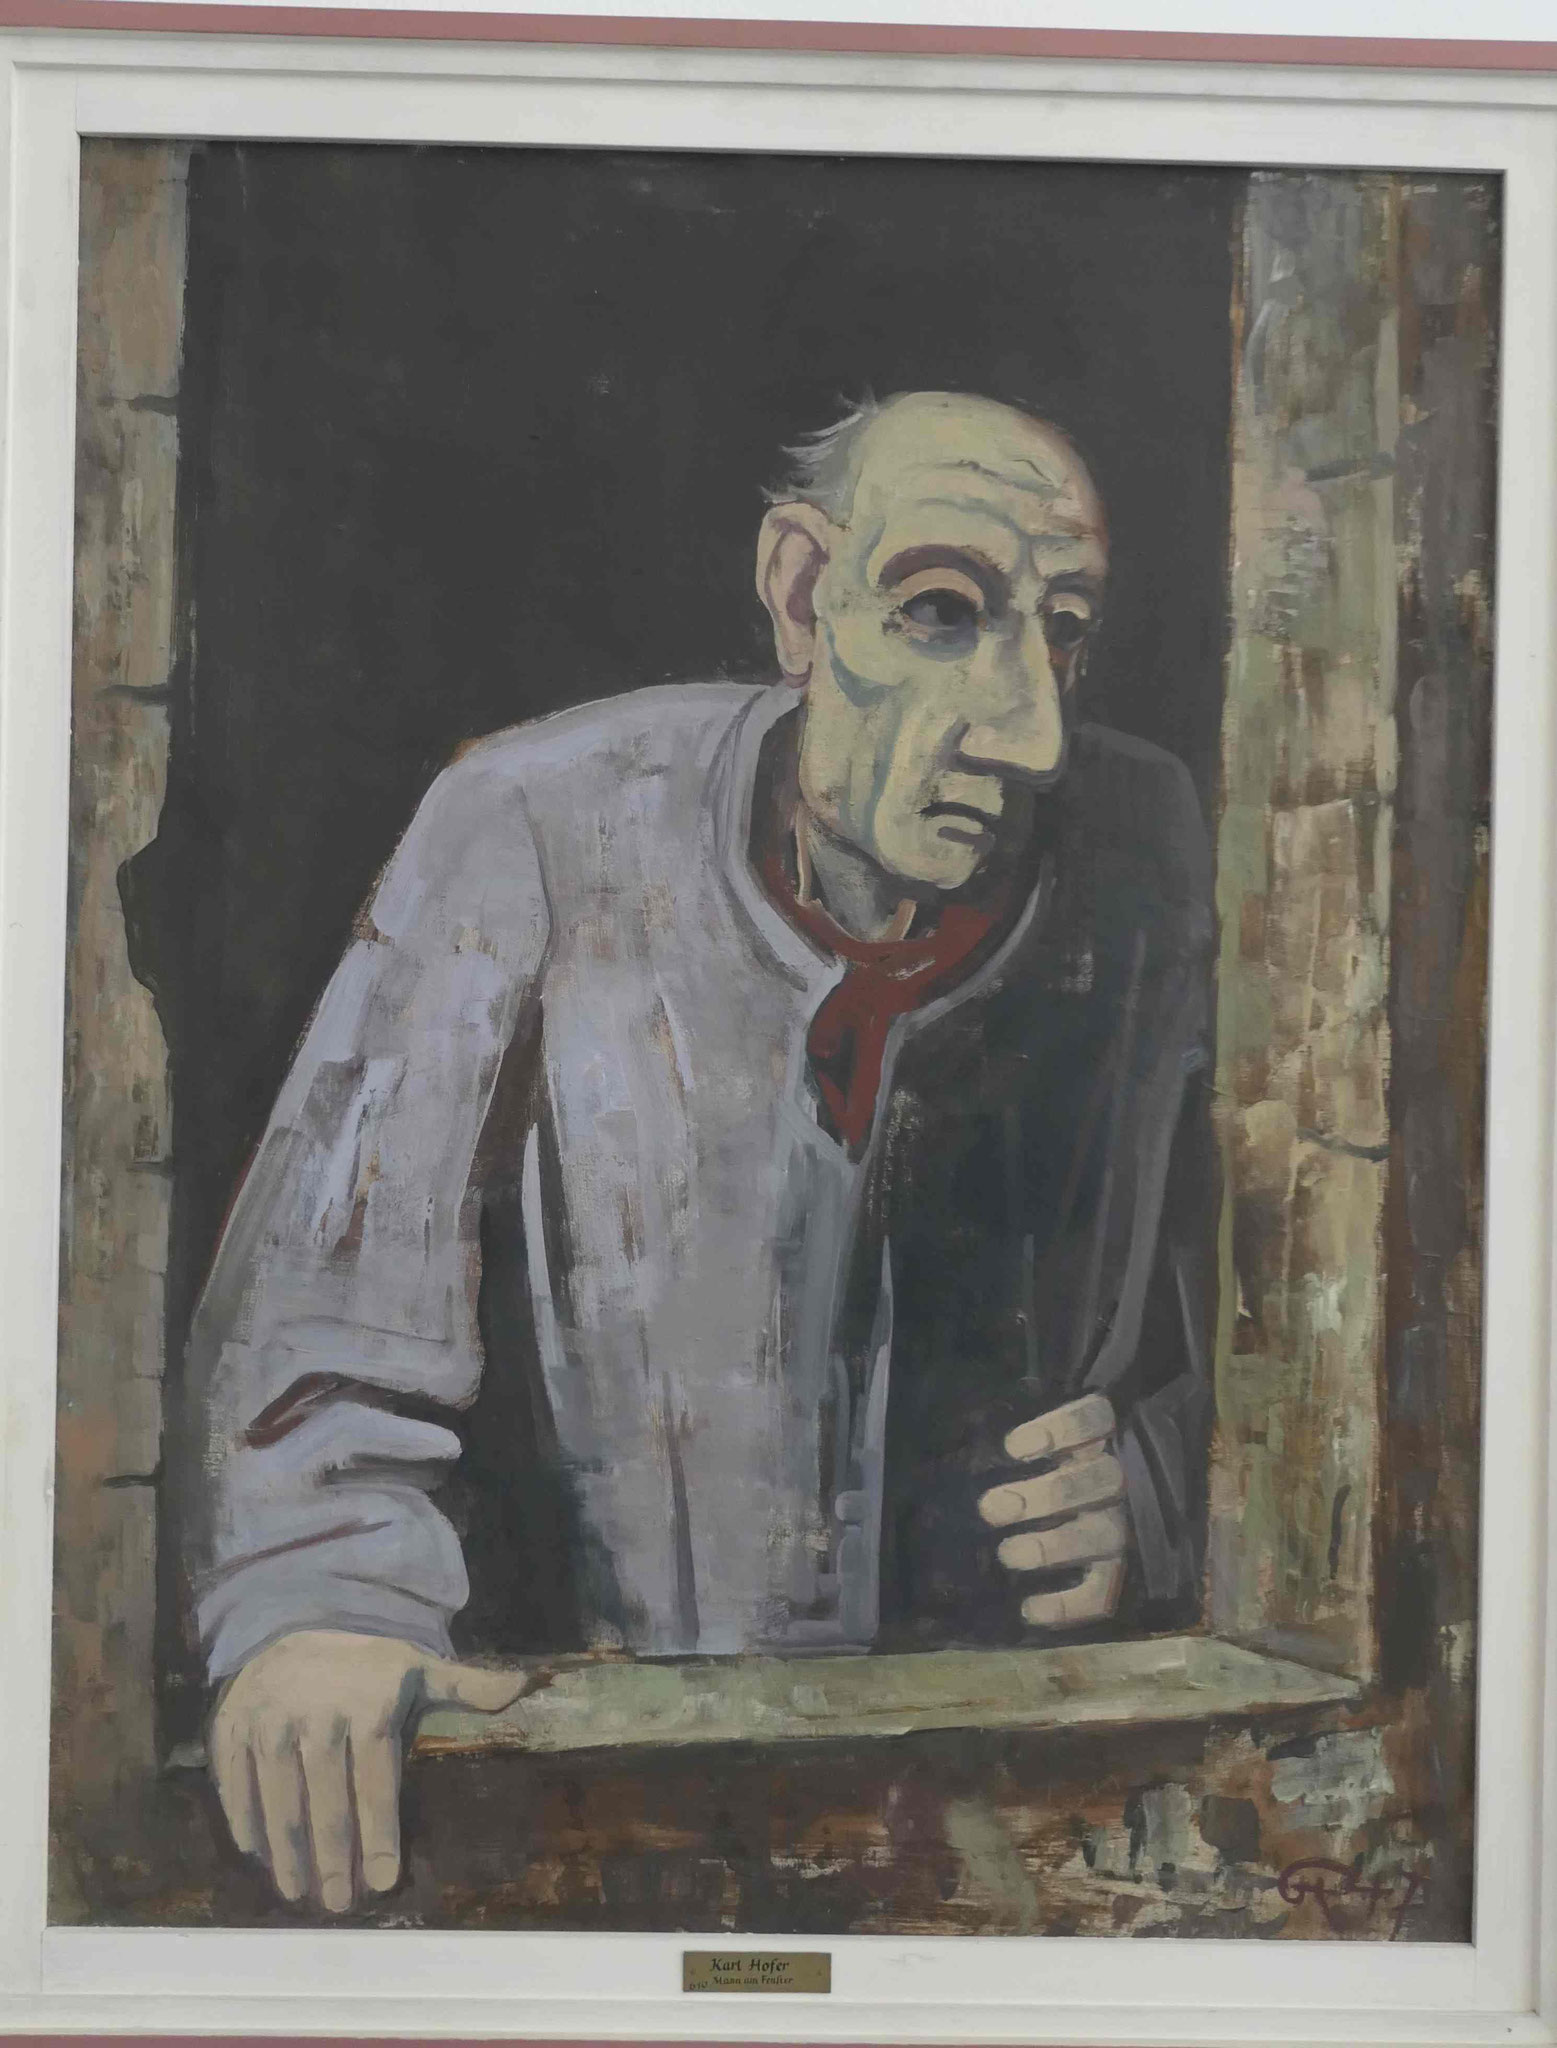 Karl Hofer, Mann am Fenster, 1947, Kunsthalle zu Kiel